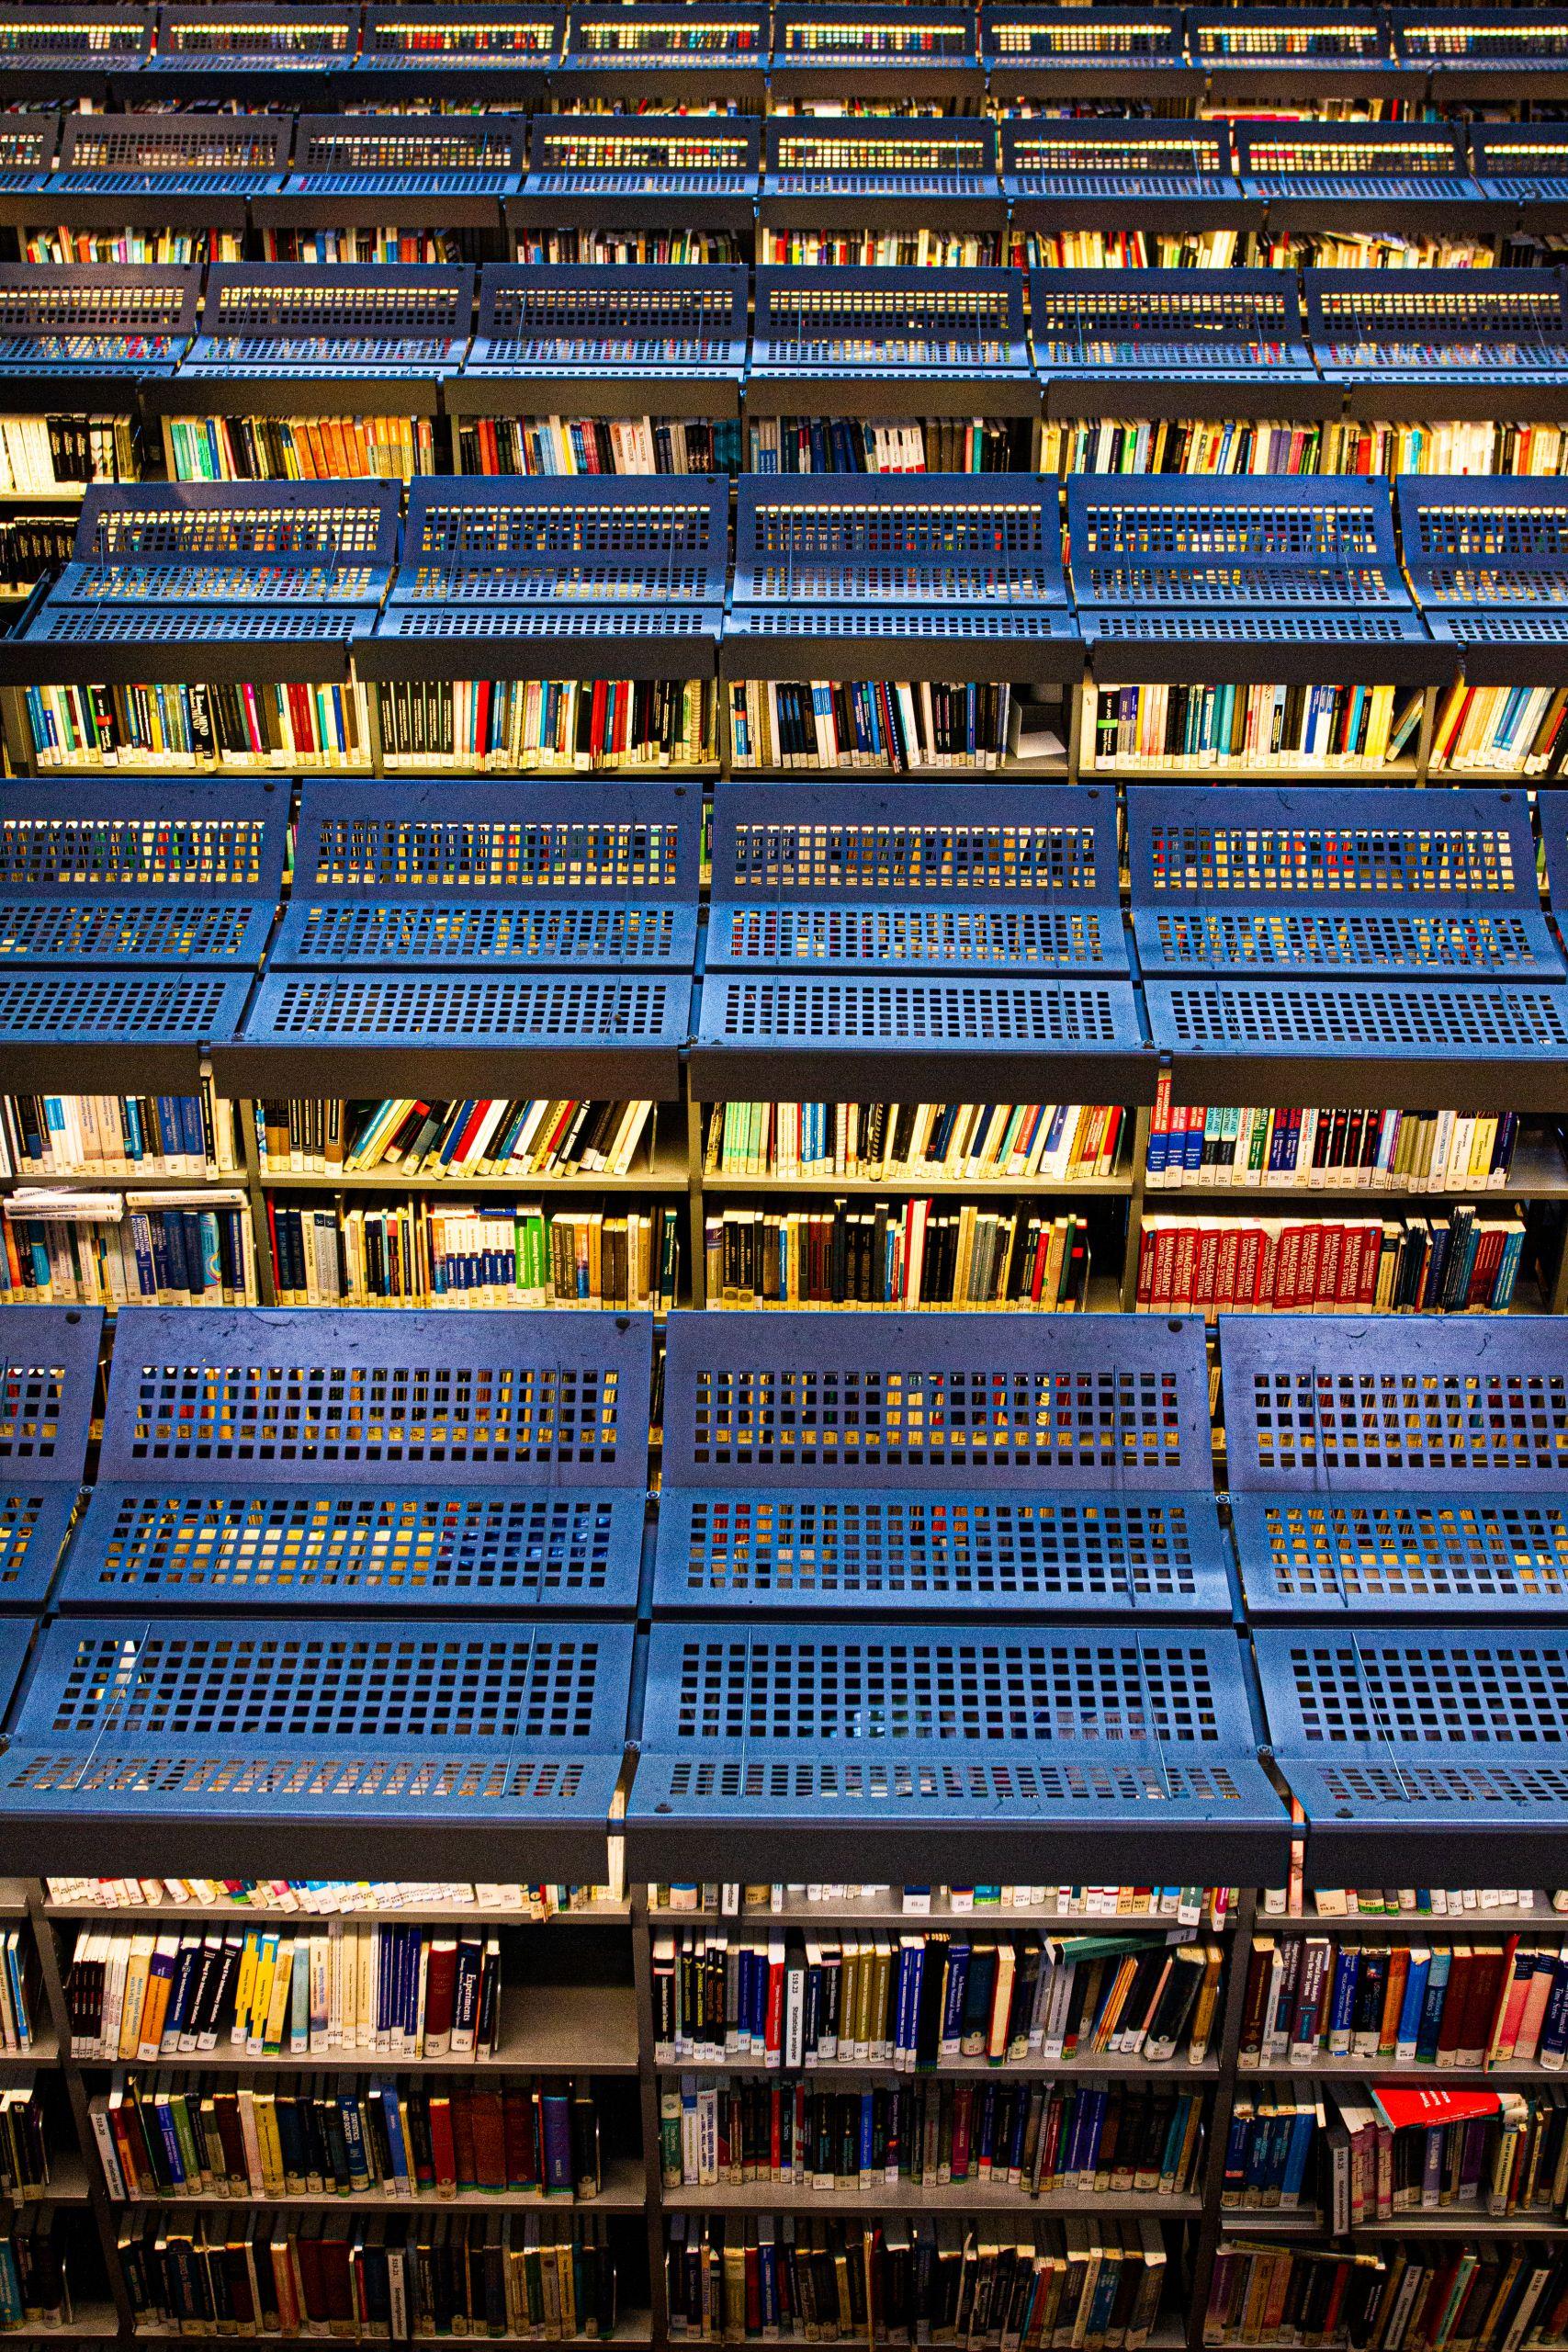 Racks with books